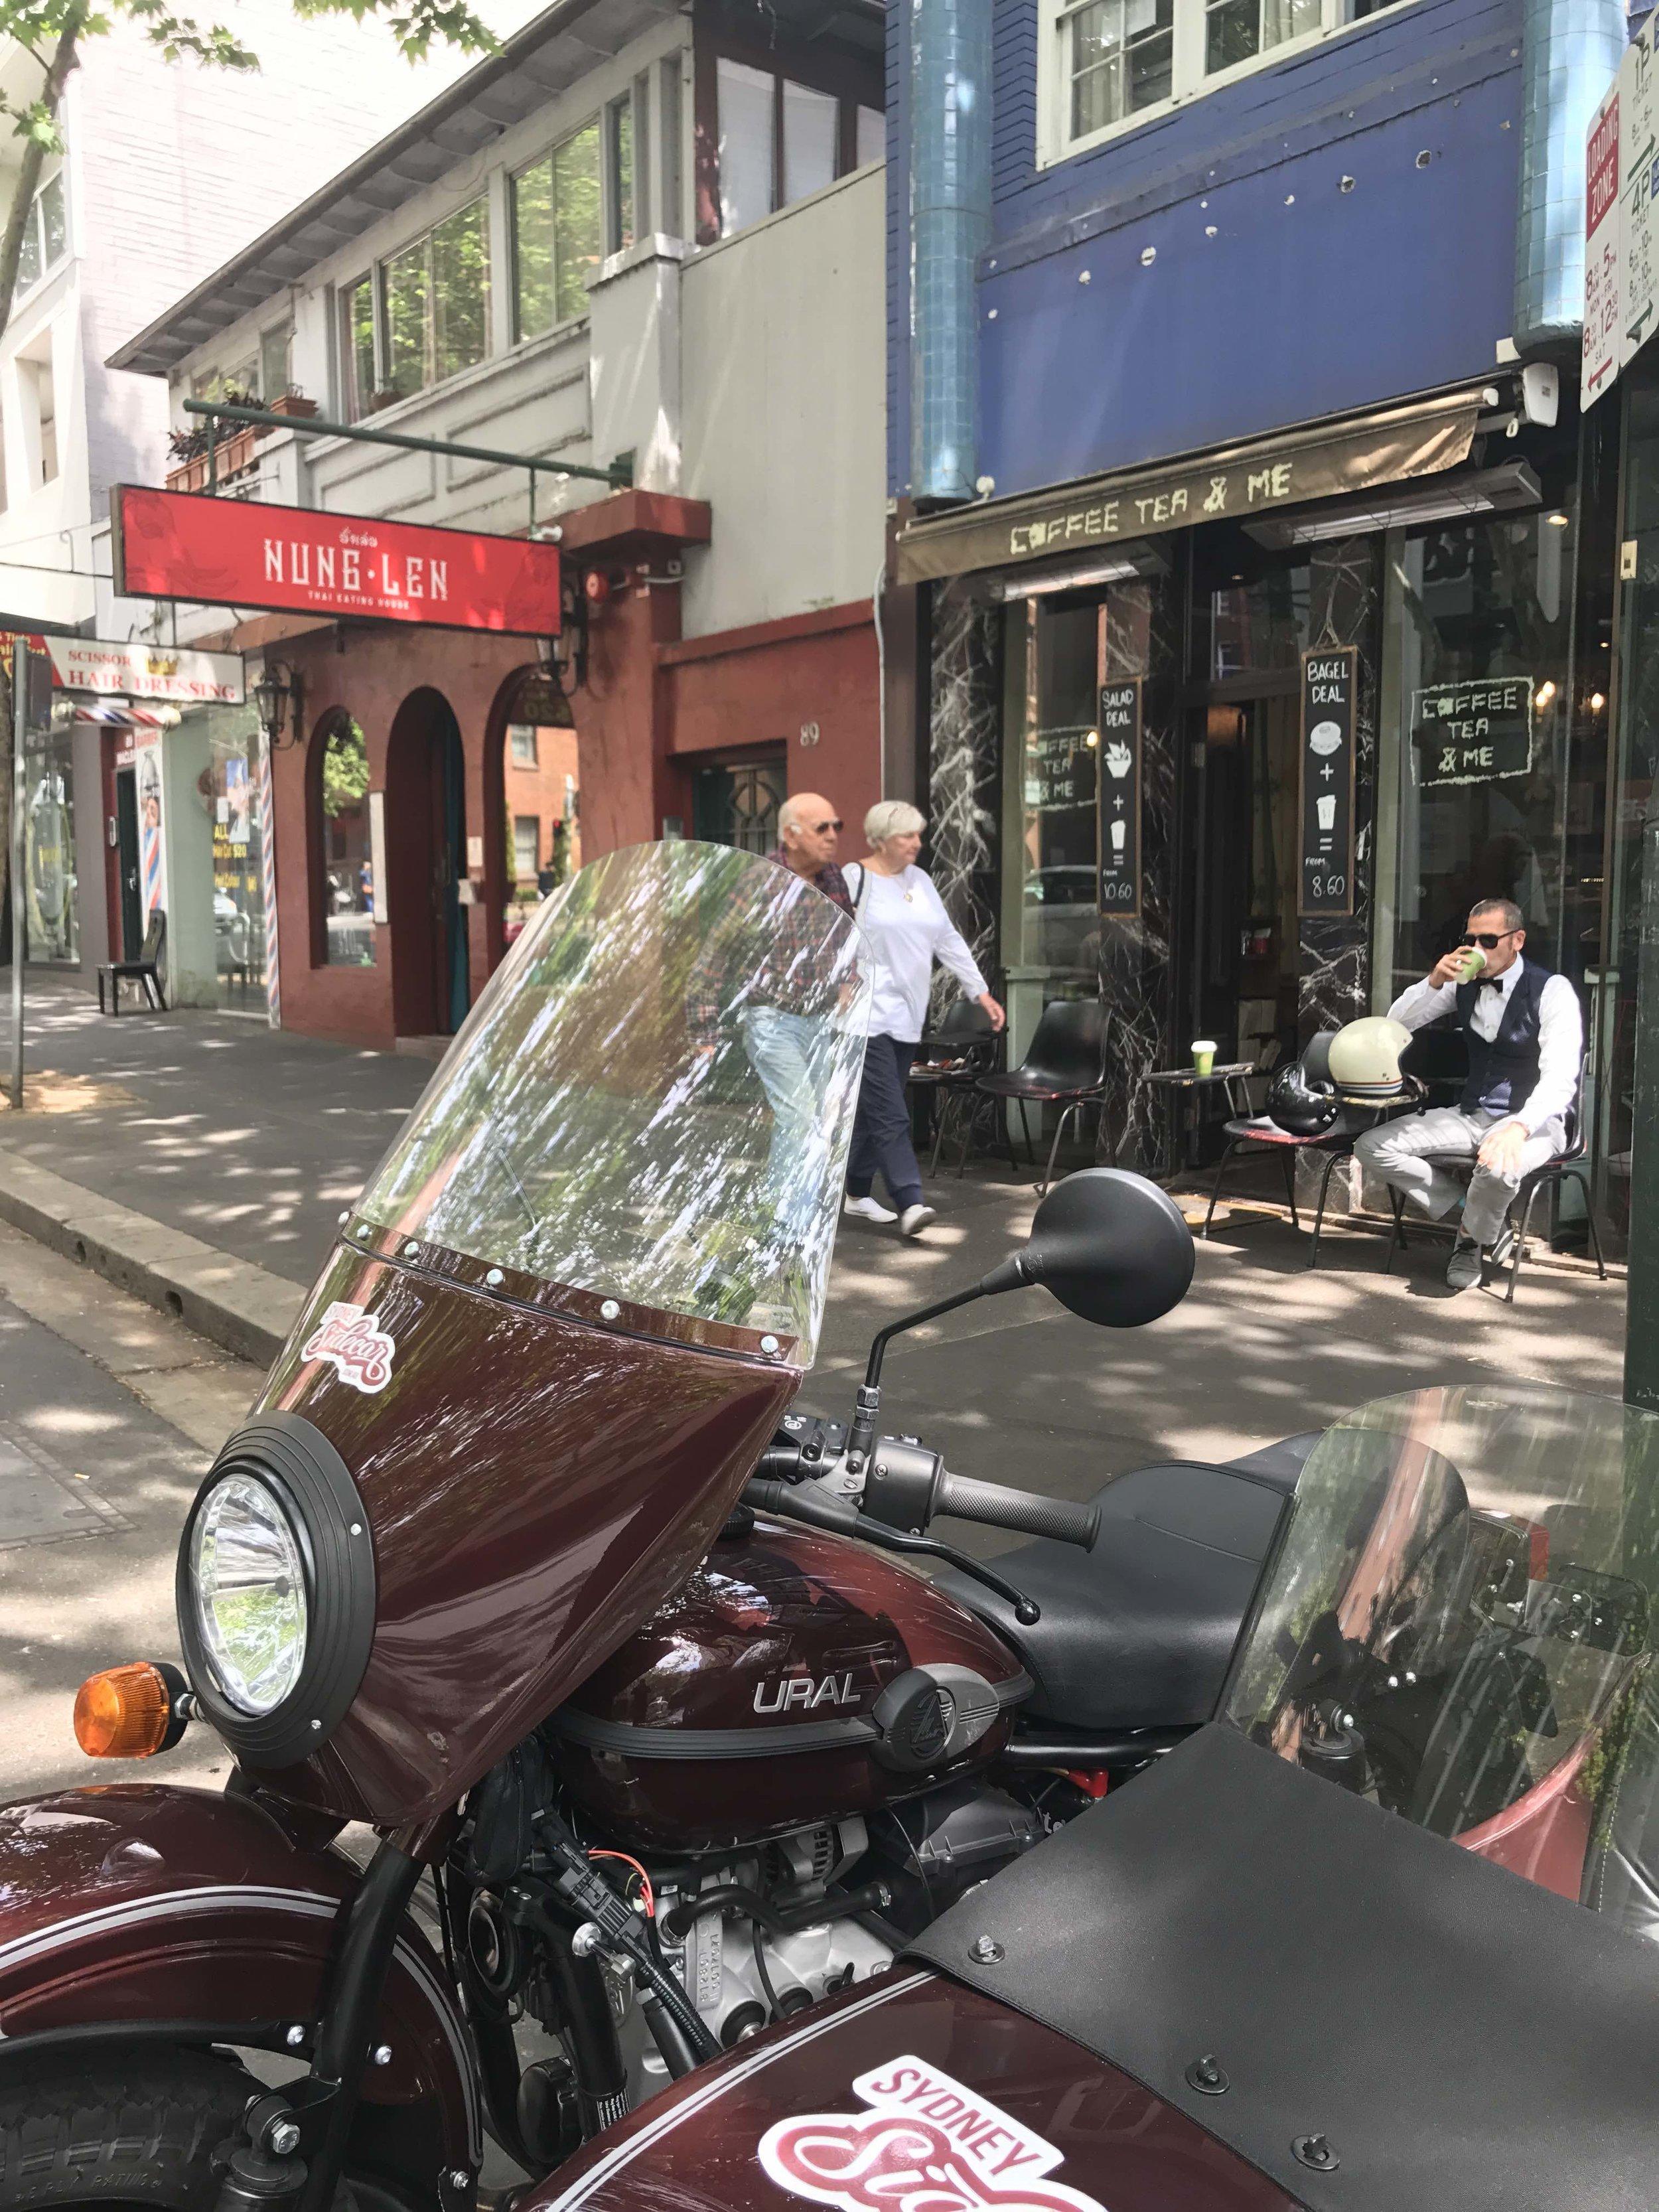 macleay-street-coffee-sydney-sidecar-experience-sydney.jpg